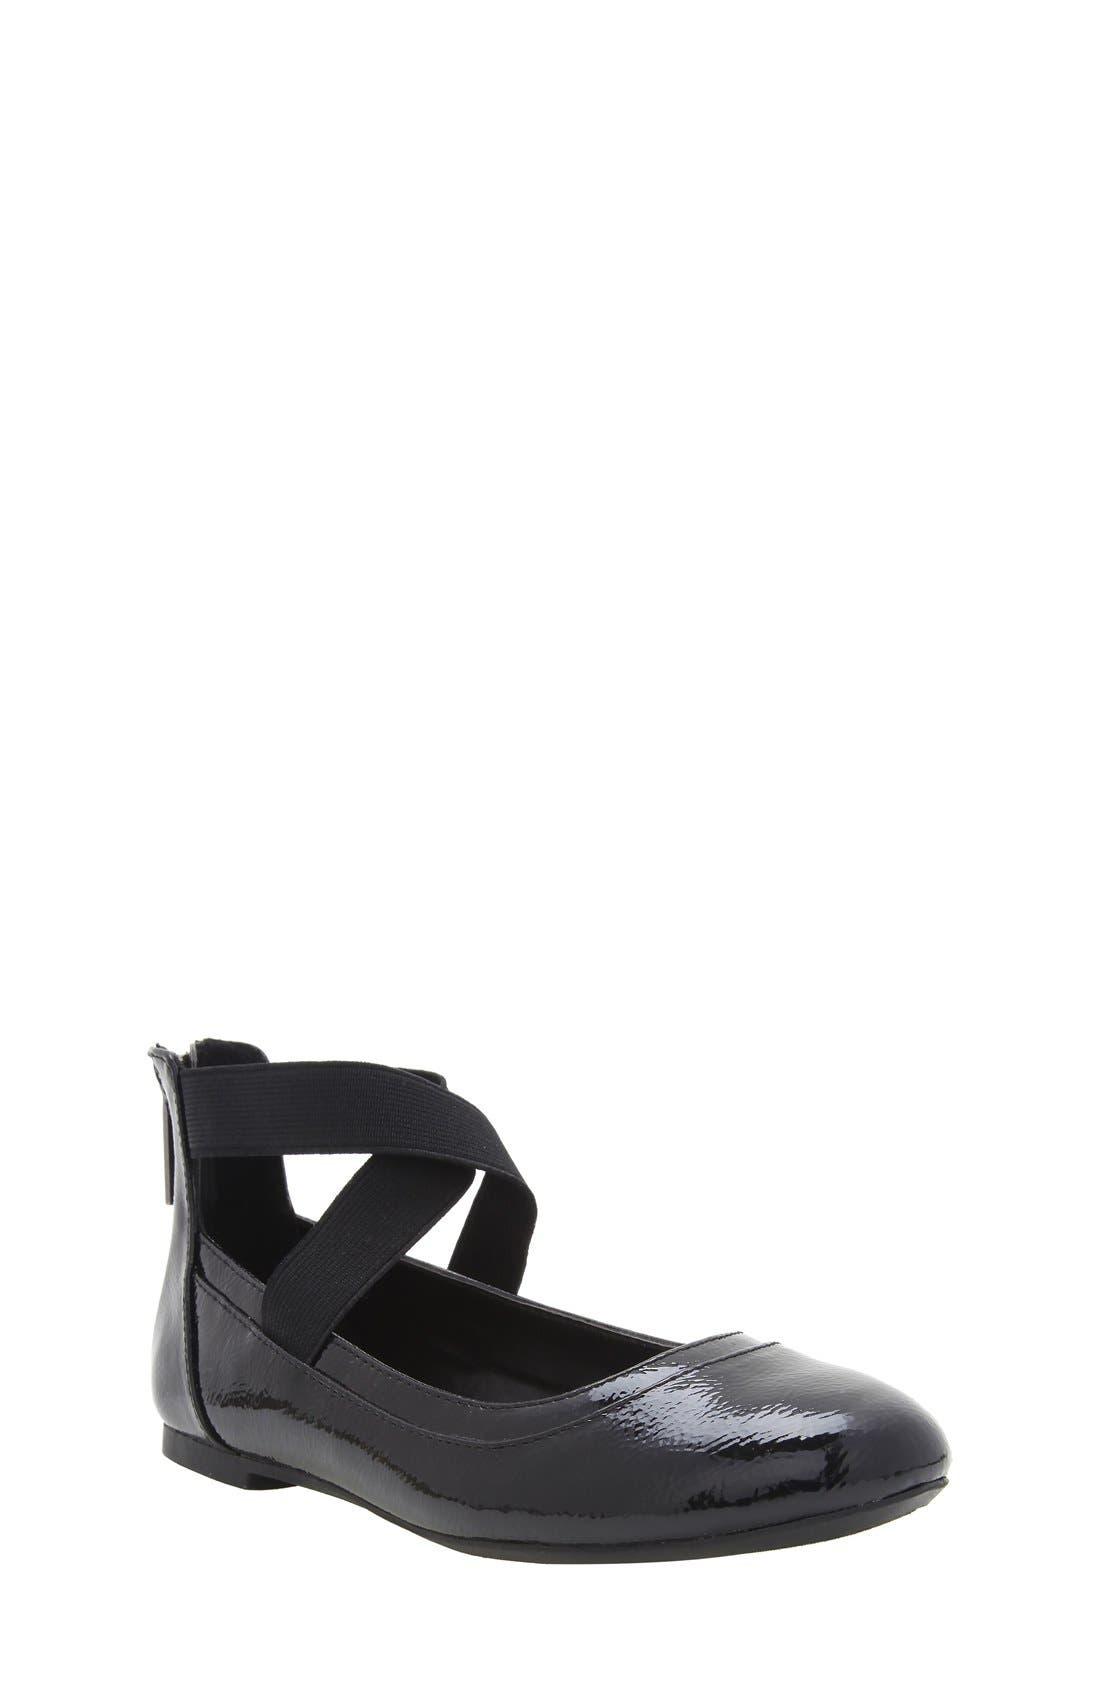 'Alicea' Ankle Strap Ballet Flat,                         Main,                         color, 004